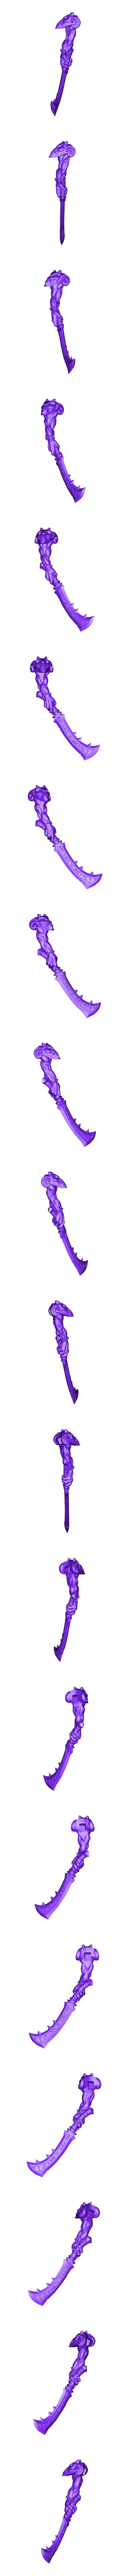 armright.stl Download free STL file Tikbalan • 3D printer design, duncanshadow